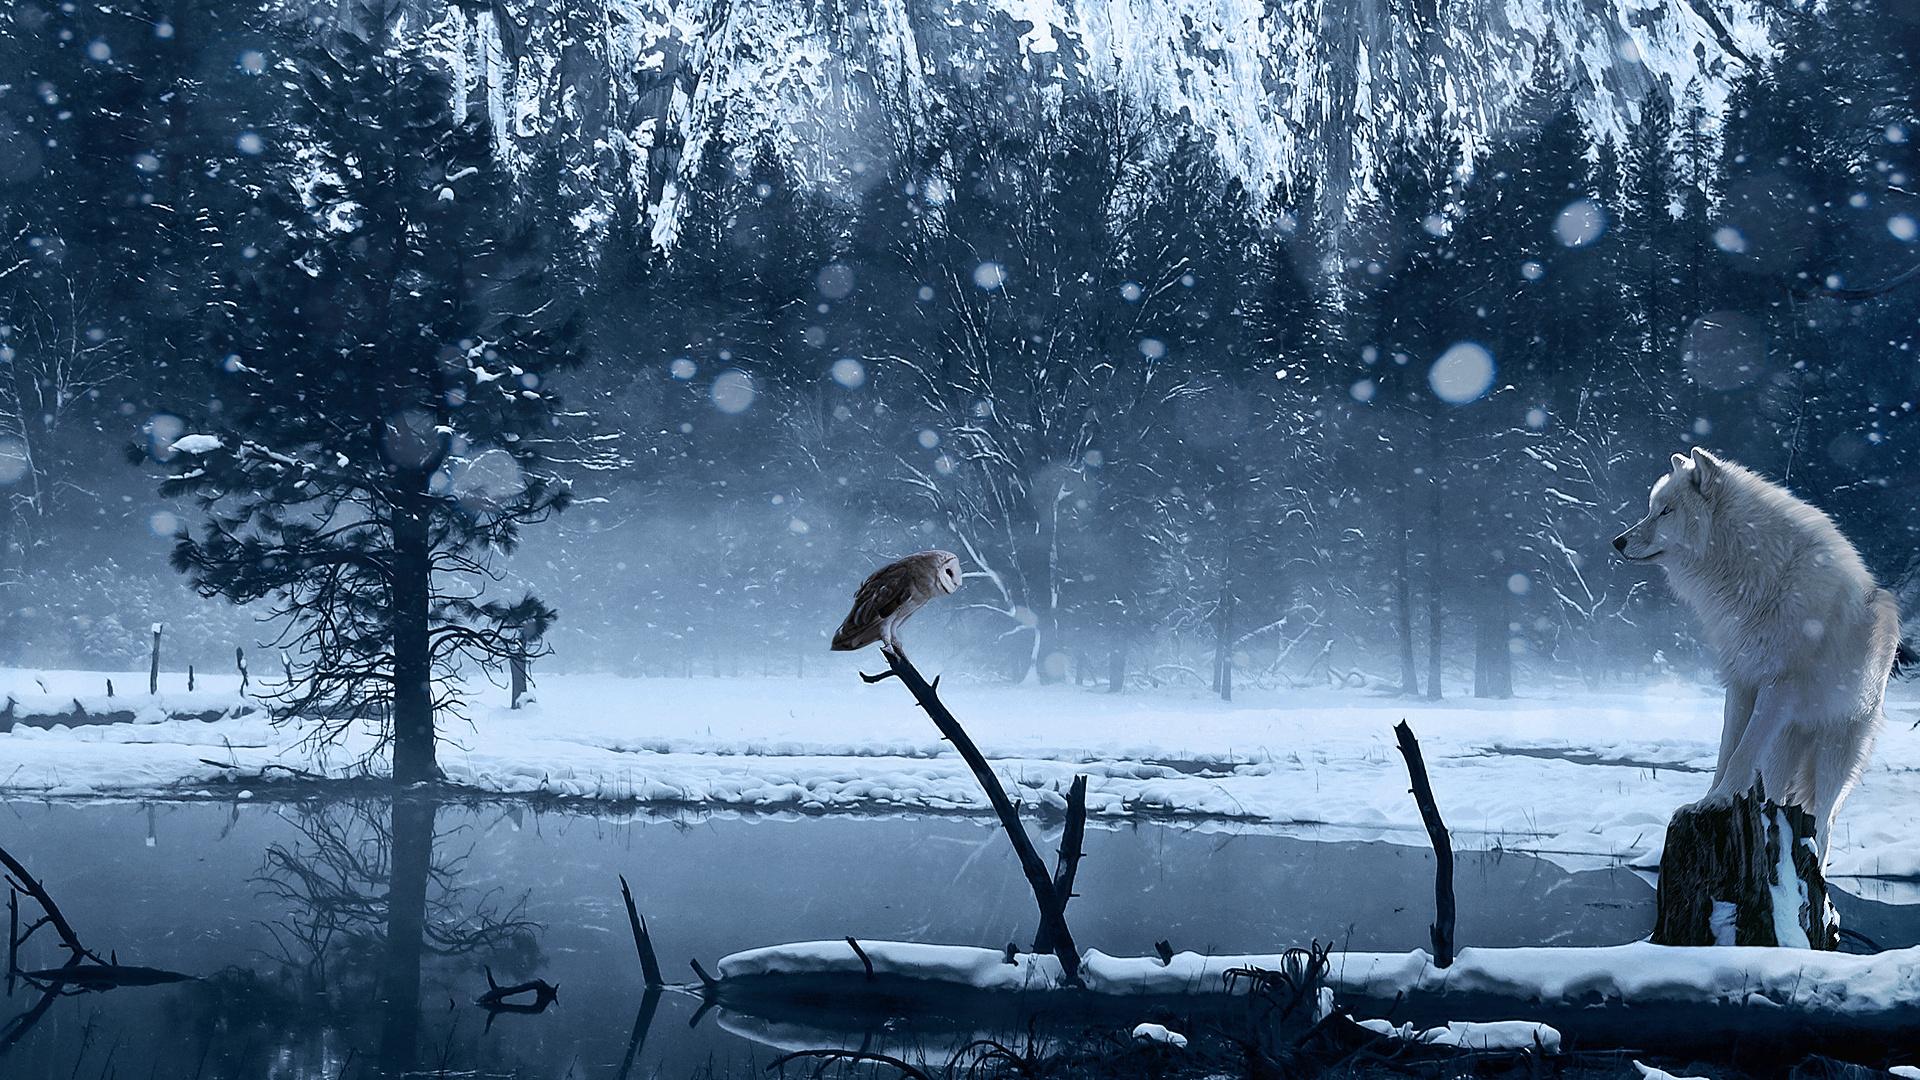 Обои волк зима снег озеро арт сова